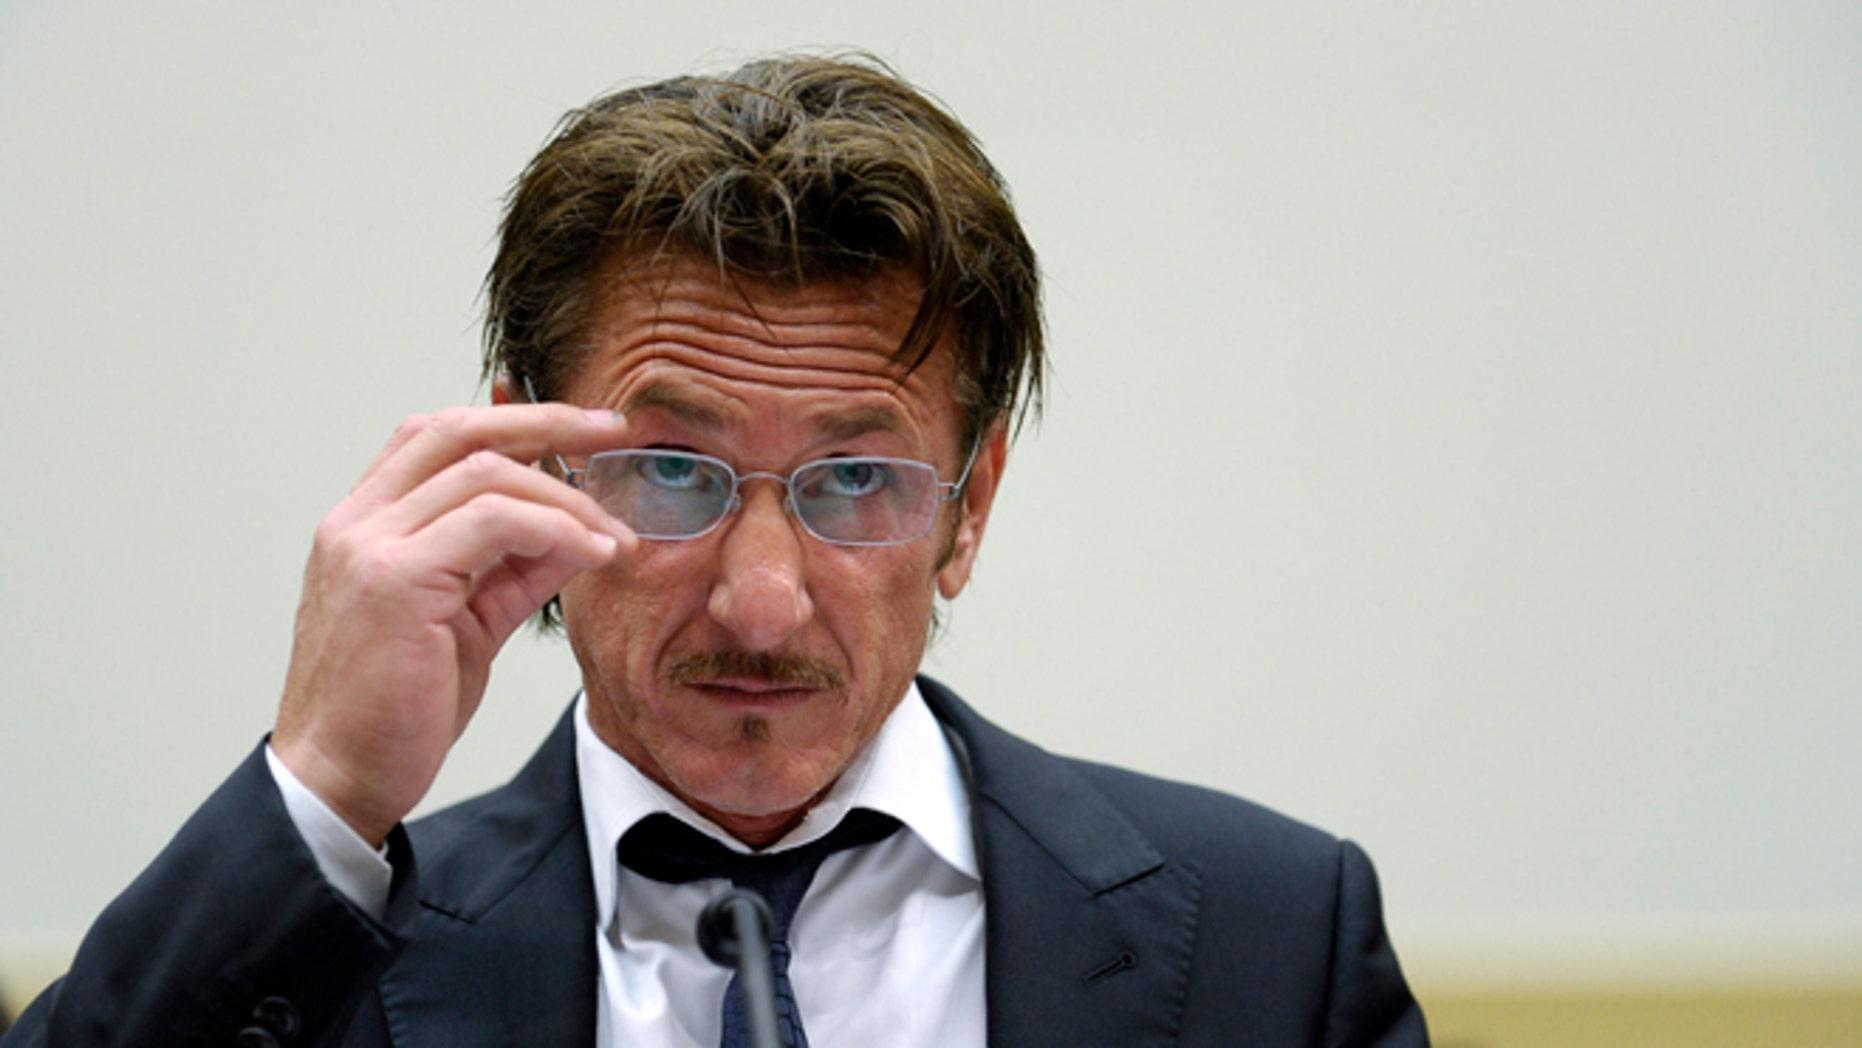 Academy Award-winning actor Sean Penn waits to testify on Capitol Hill in Washington, Monday, May 20, 2013.